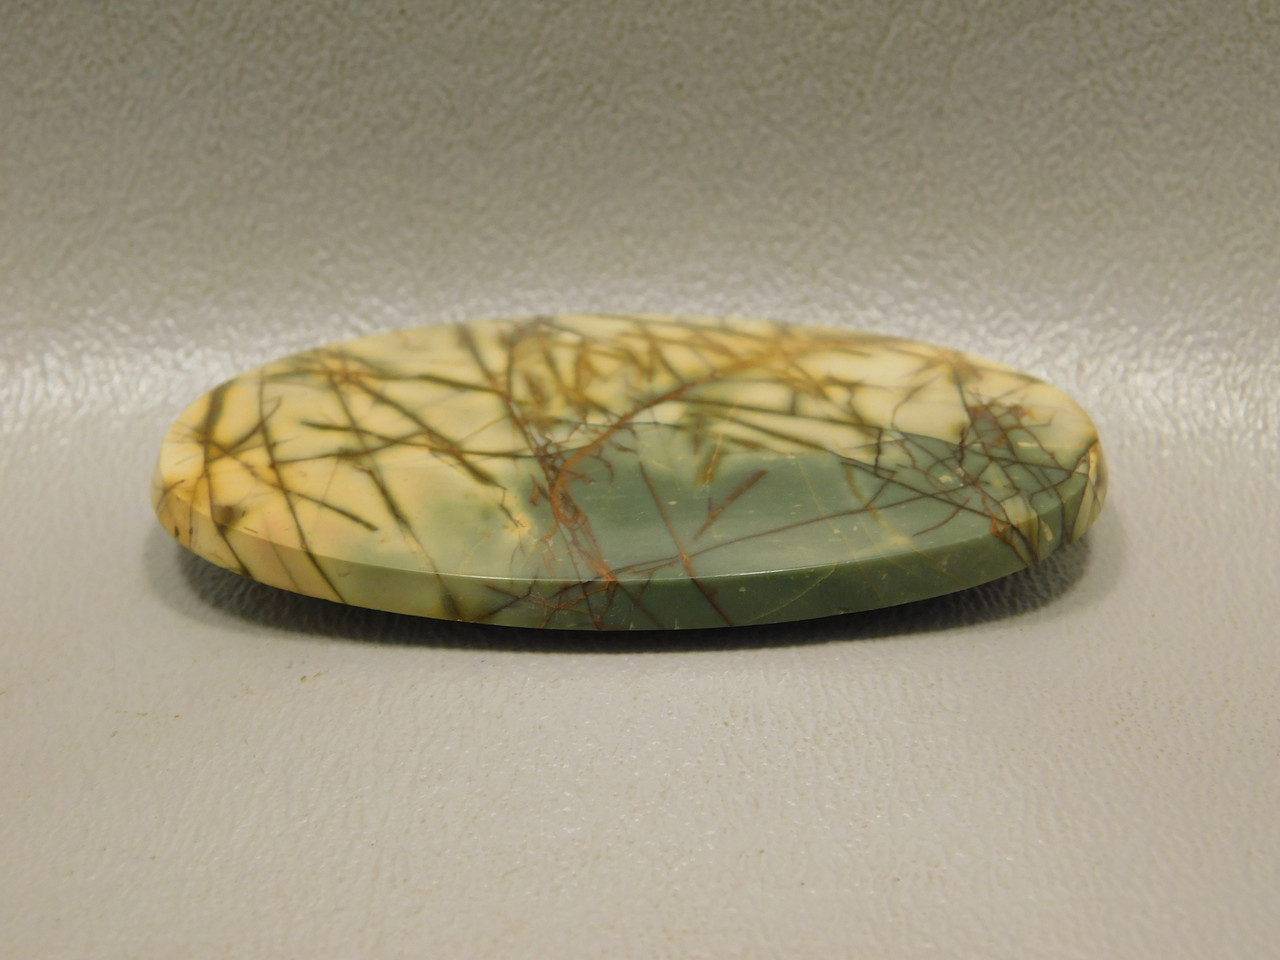 Red River Jasper Cabochon Jewelry Stone Oval #13